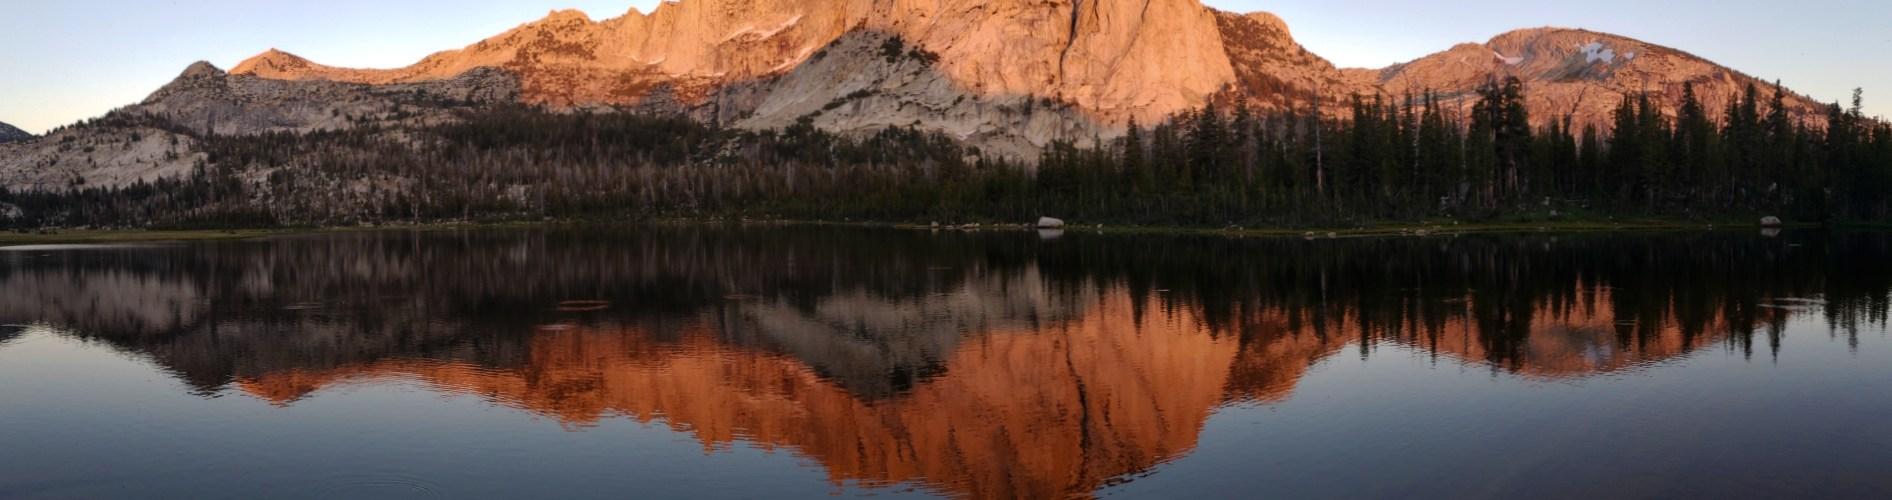 Yosemite National Park Nelson Lake